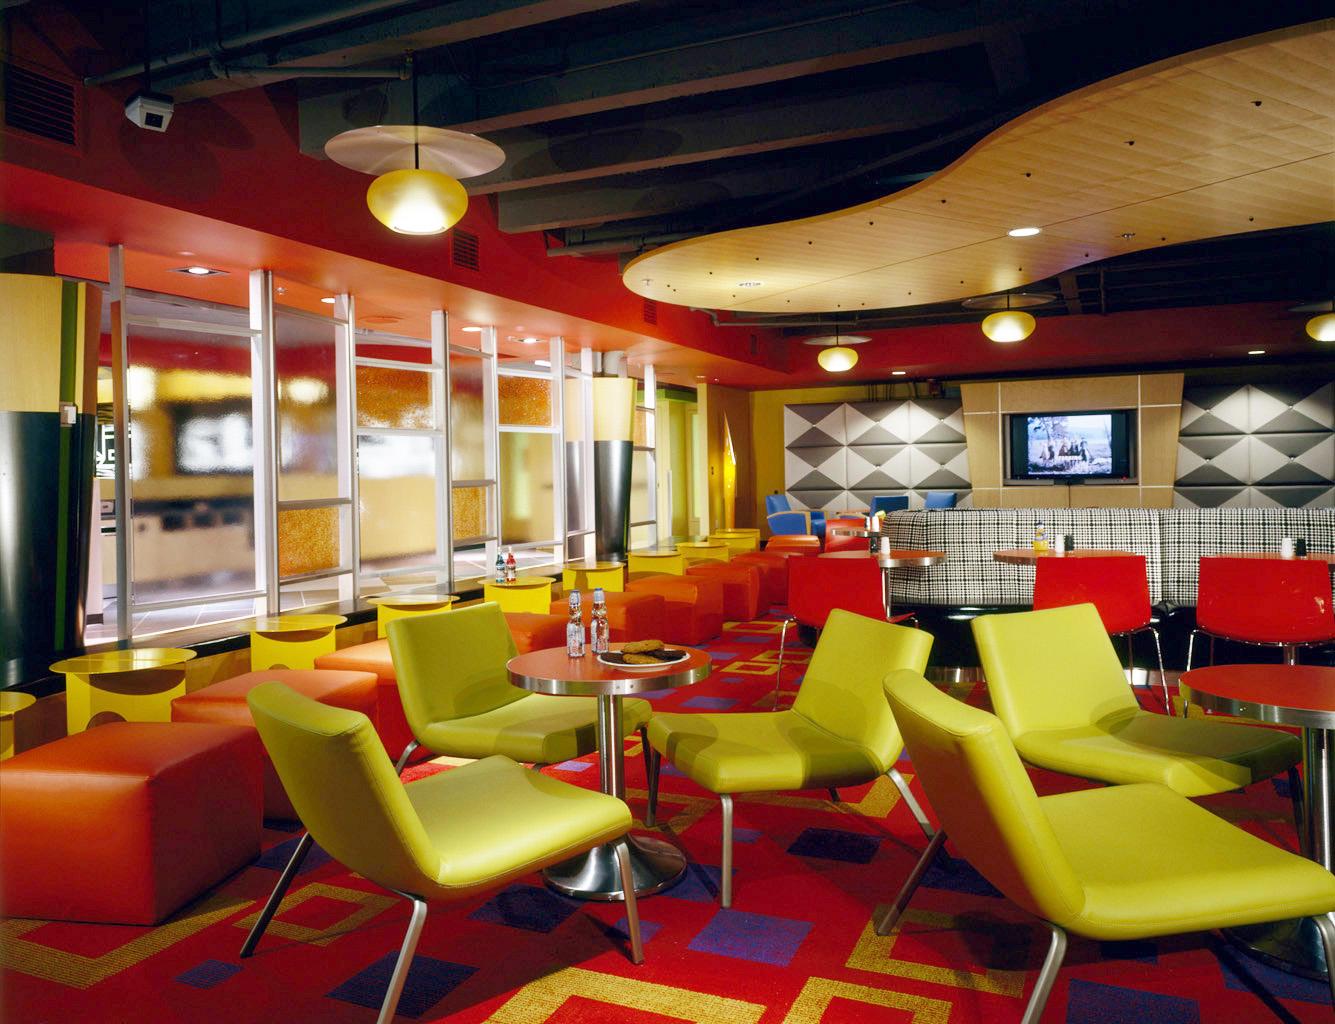 UW Terry Lander Dining Hall Interior Lounge View